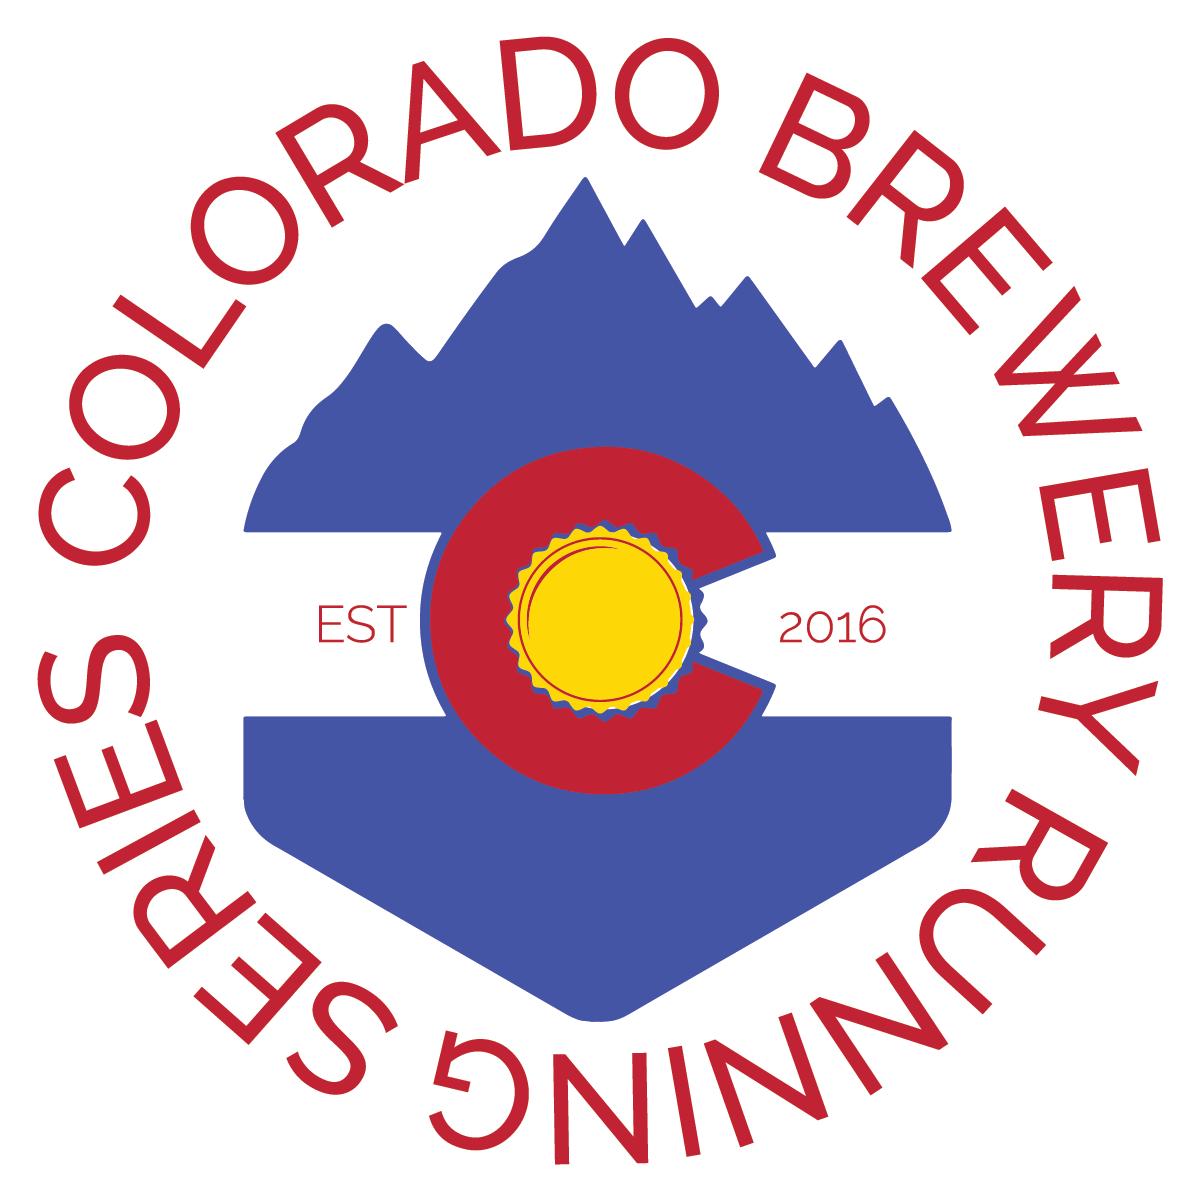 Colorado Brewery Running Series's logo